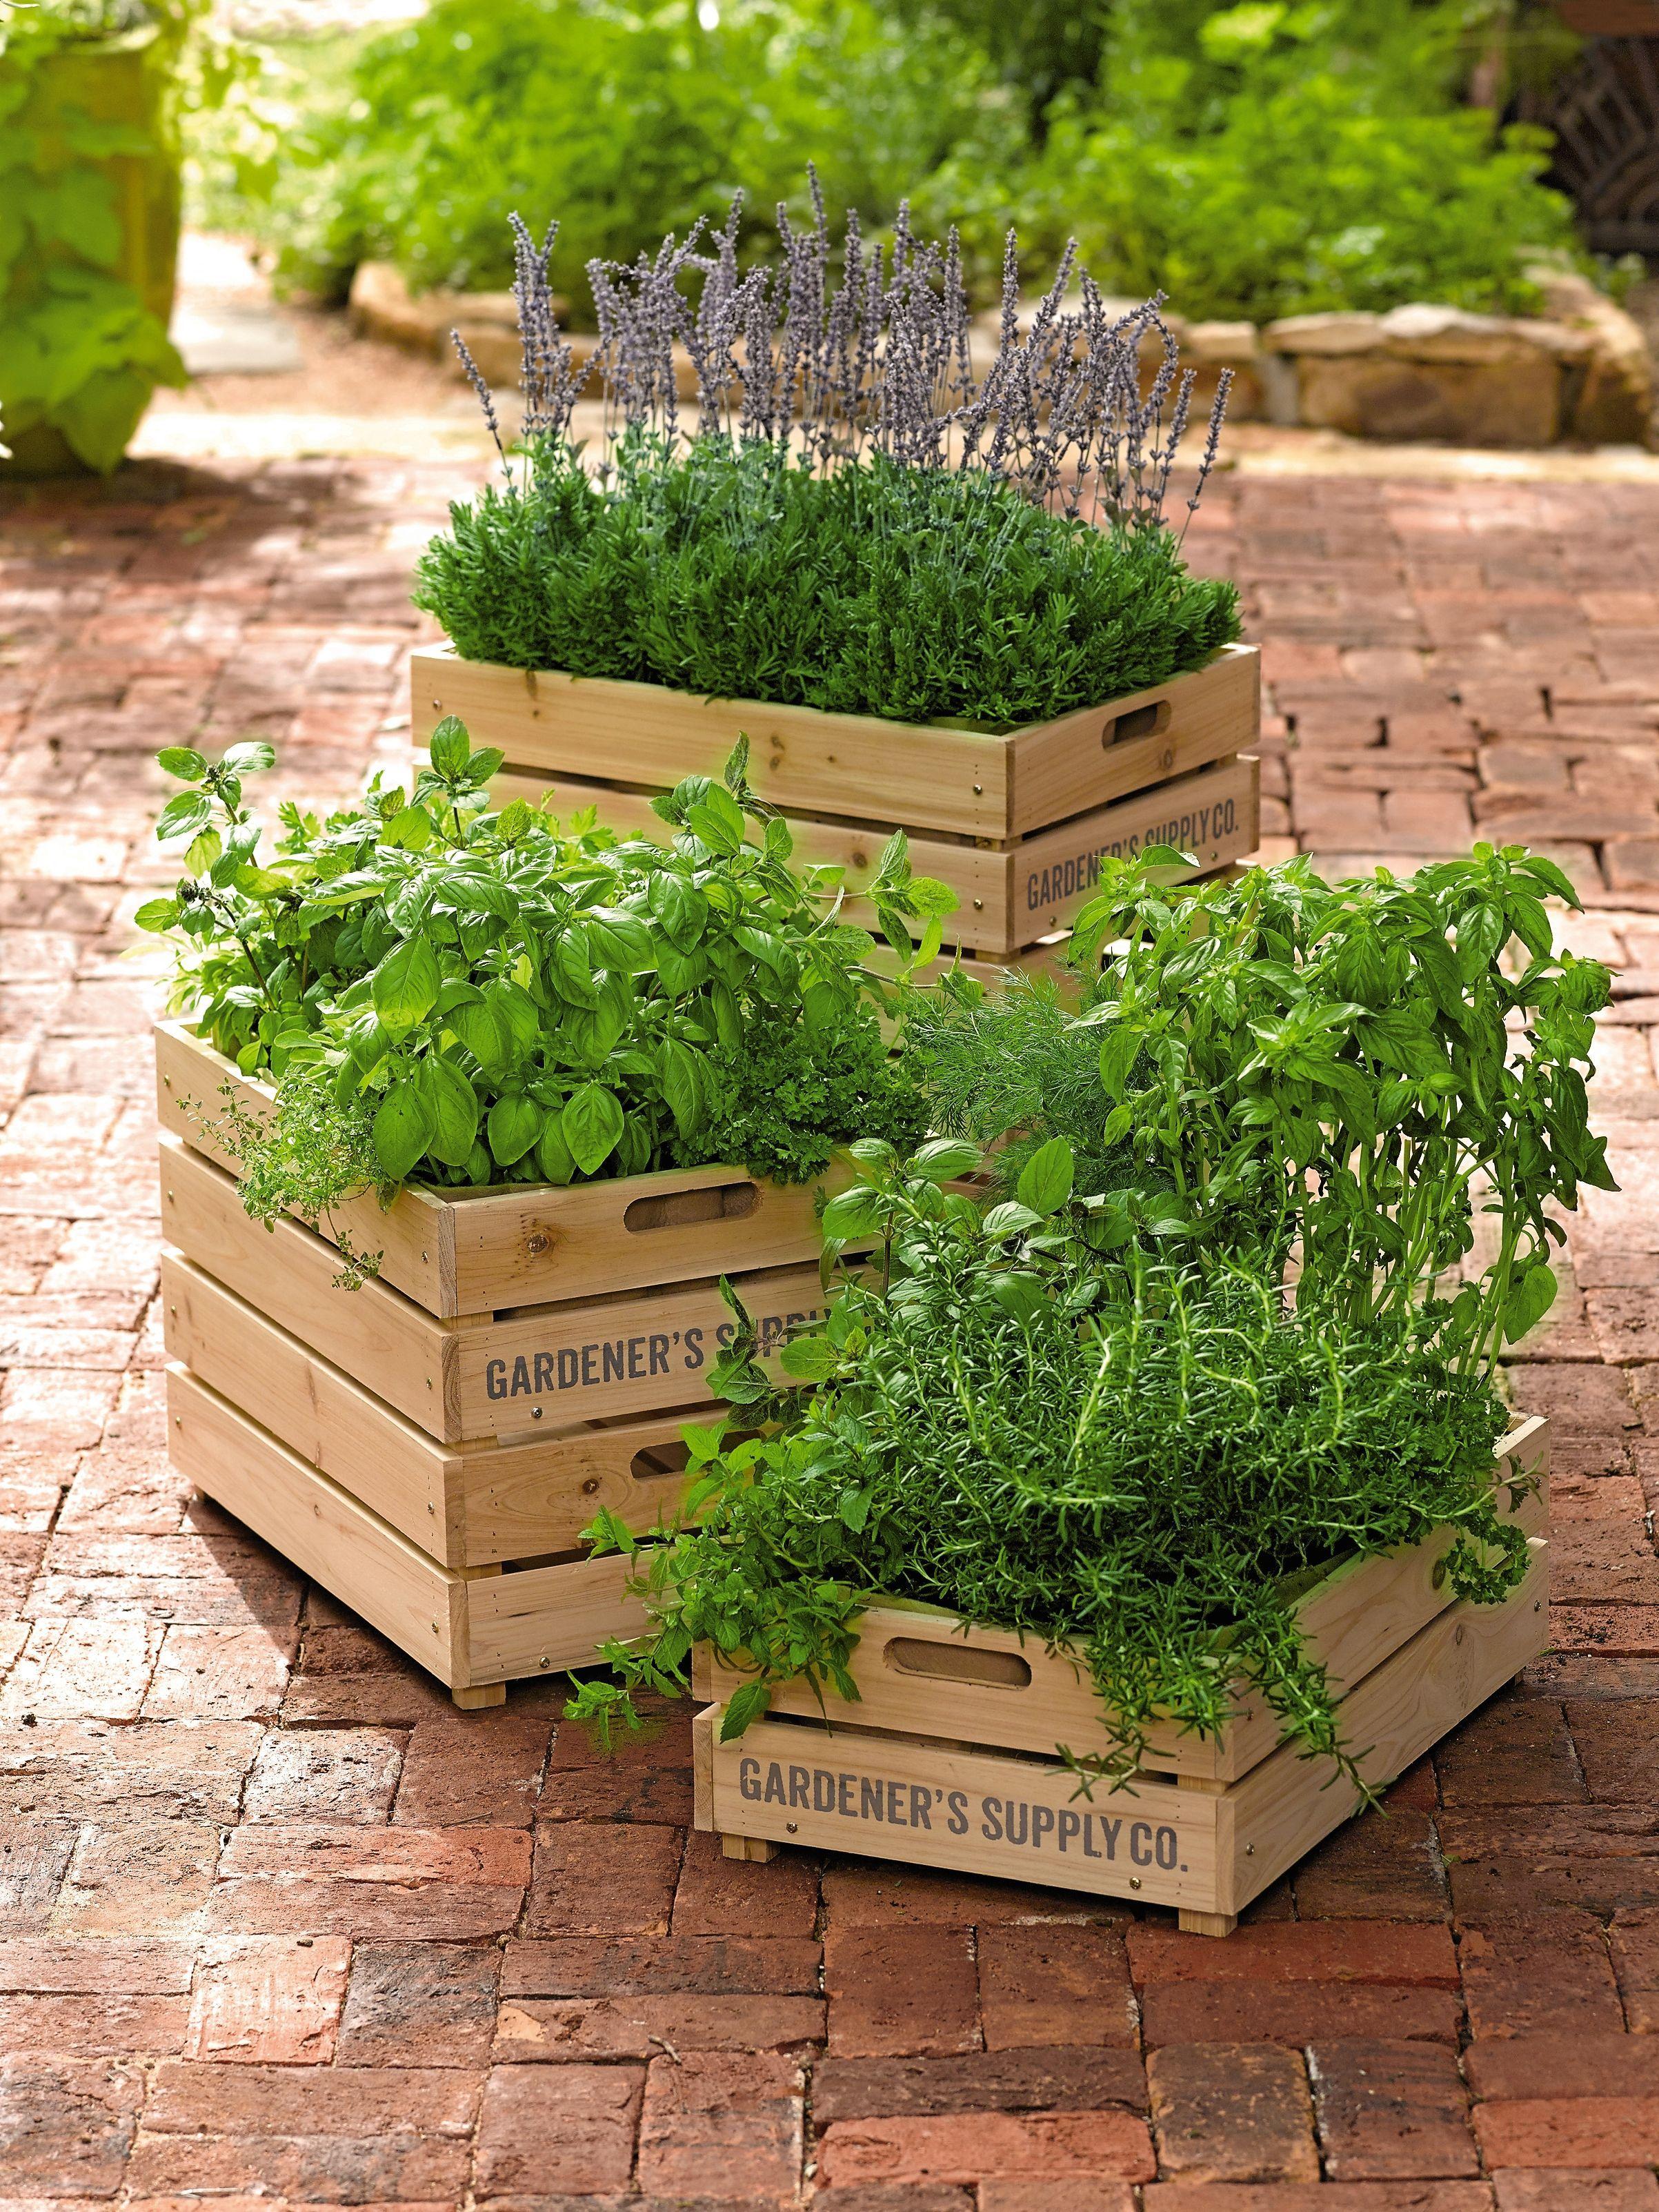 Herb Box Wooden Crate Planter With Liner Gardener S Supply Jardiniere En Bois Jardins En Bois Bacs De Jardin